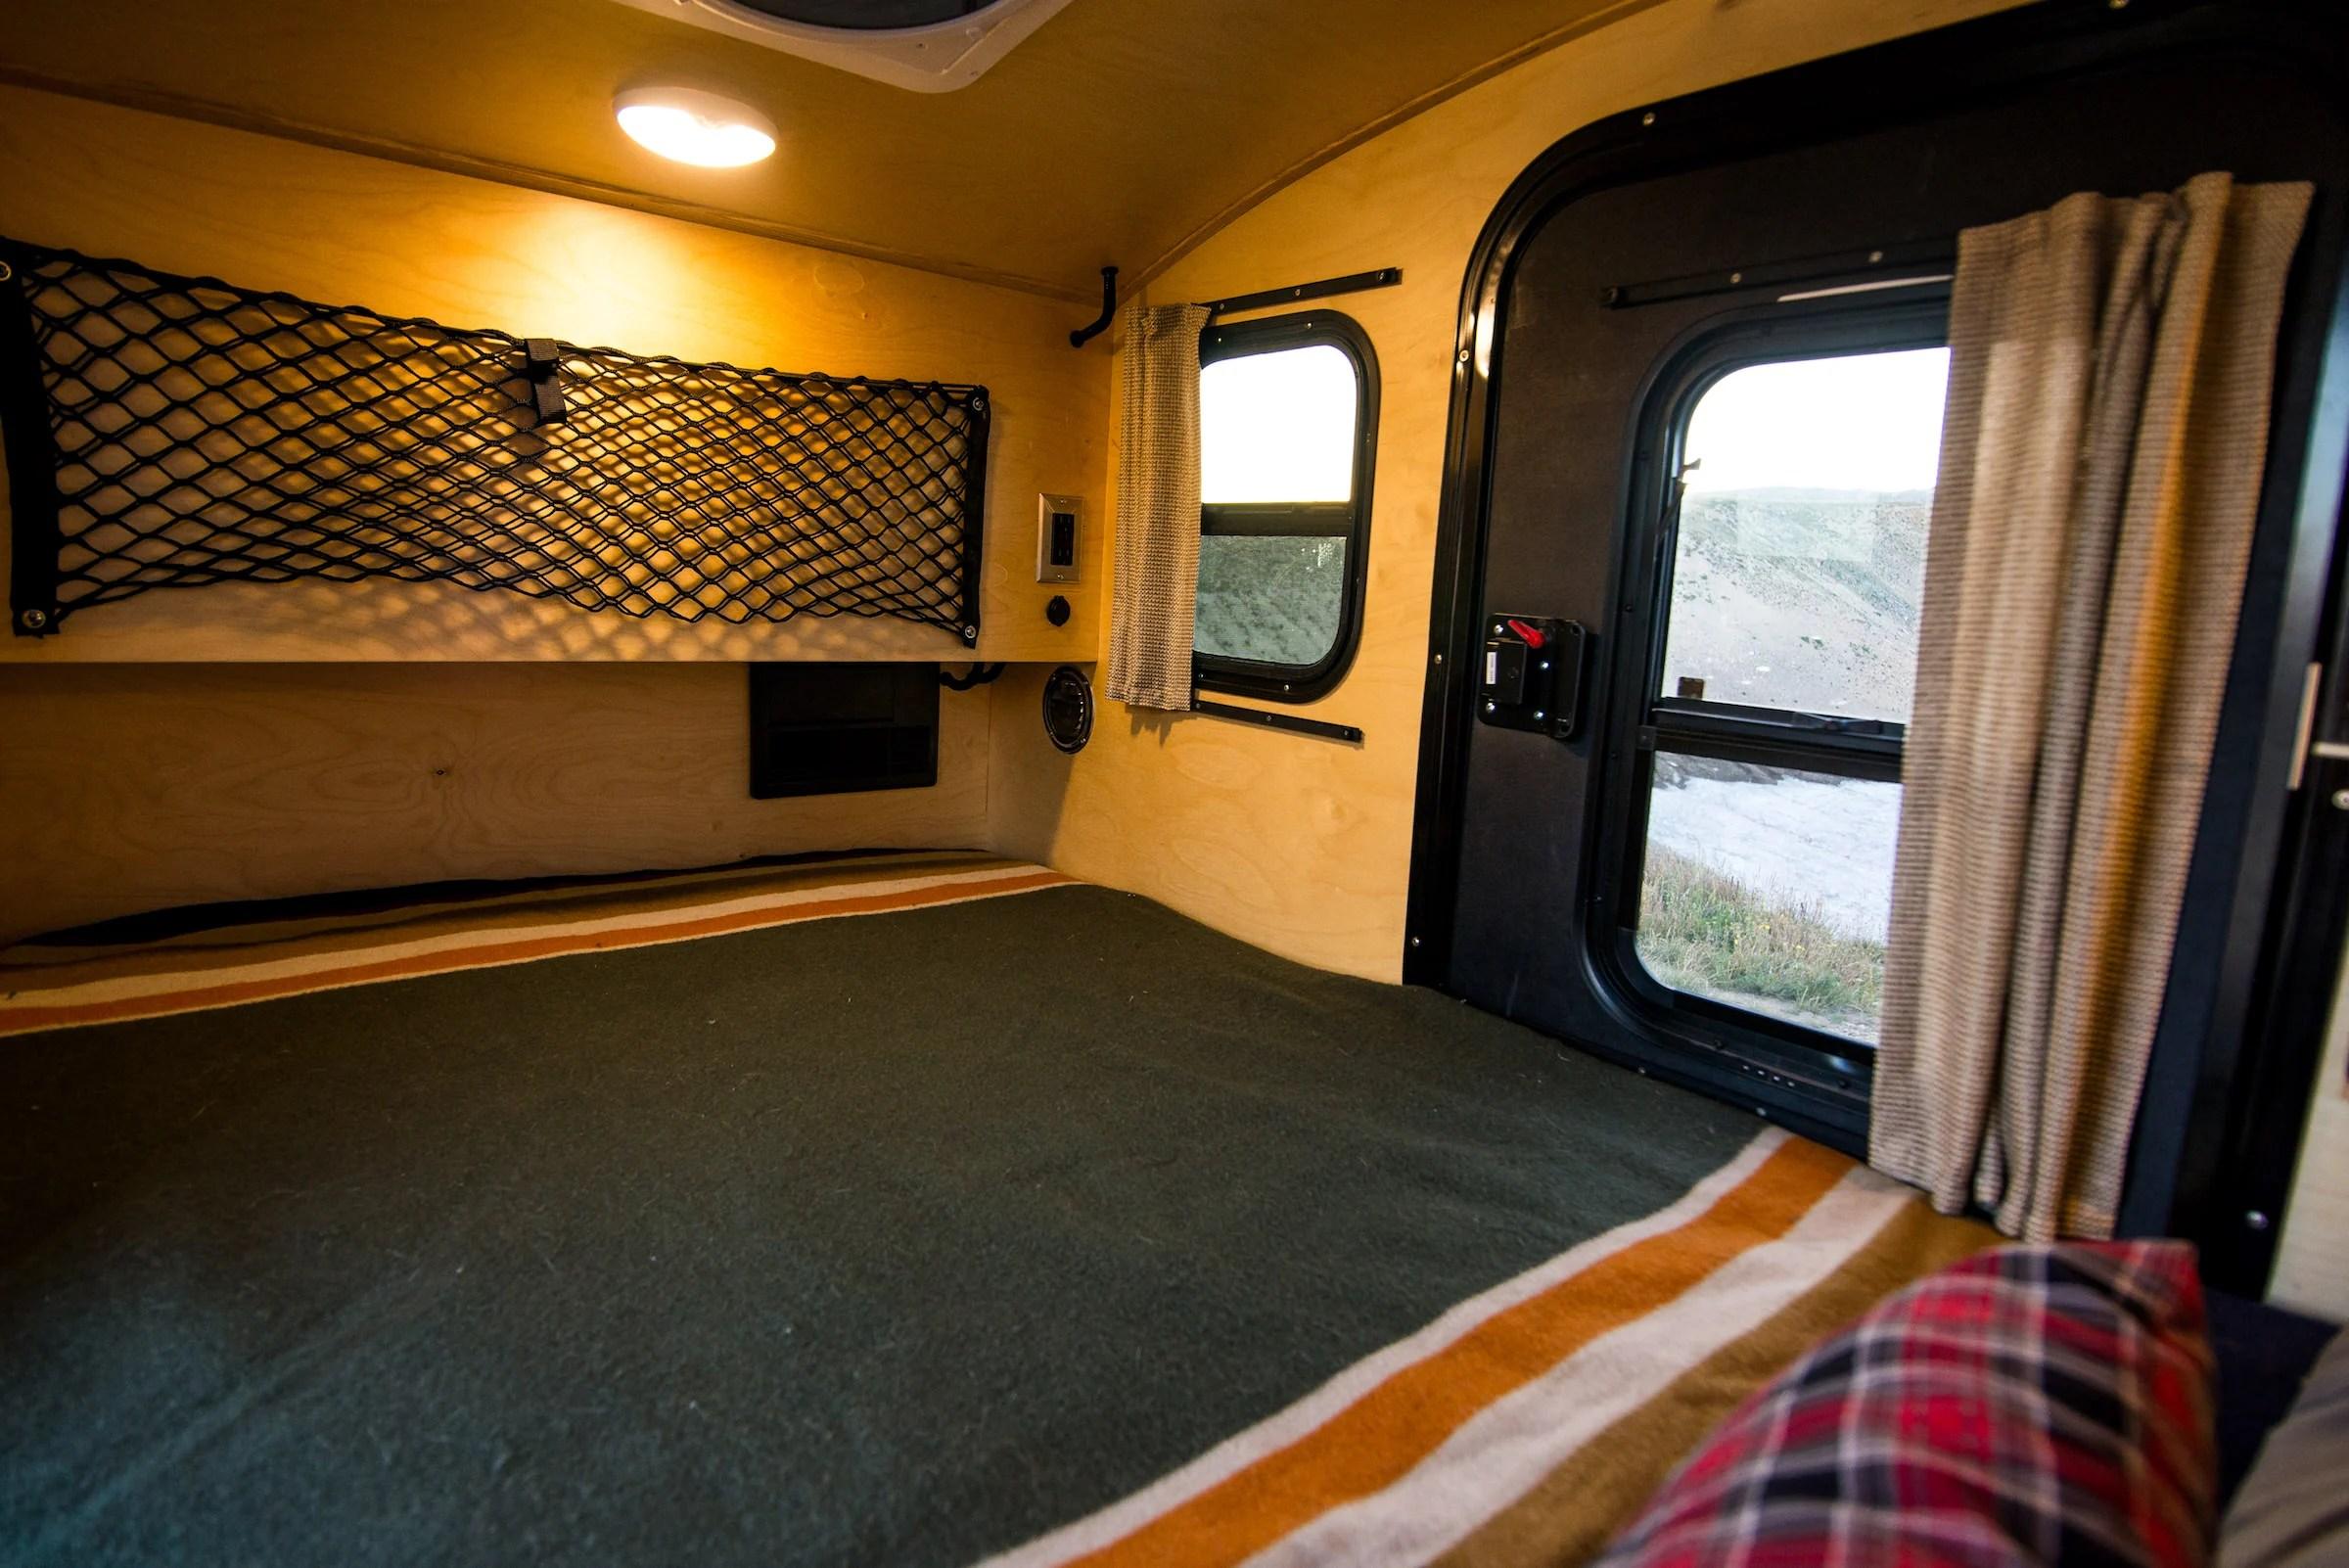 how to buy kitchen cabinets diy refinish timberleaf pika teardrop camper trailer - $11,750 usd